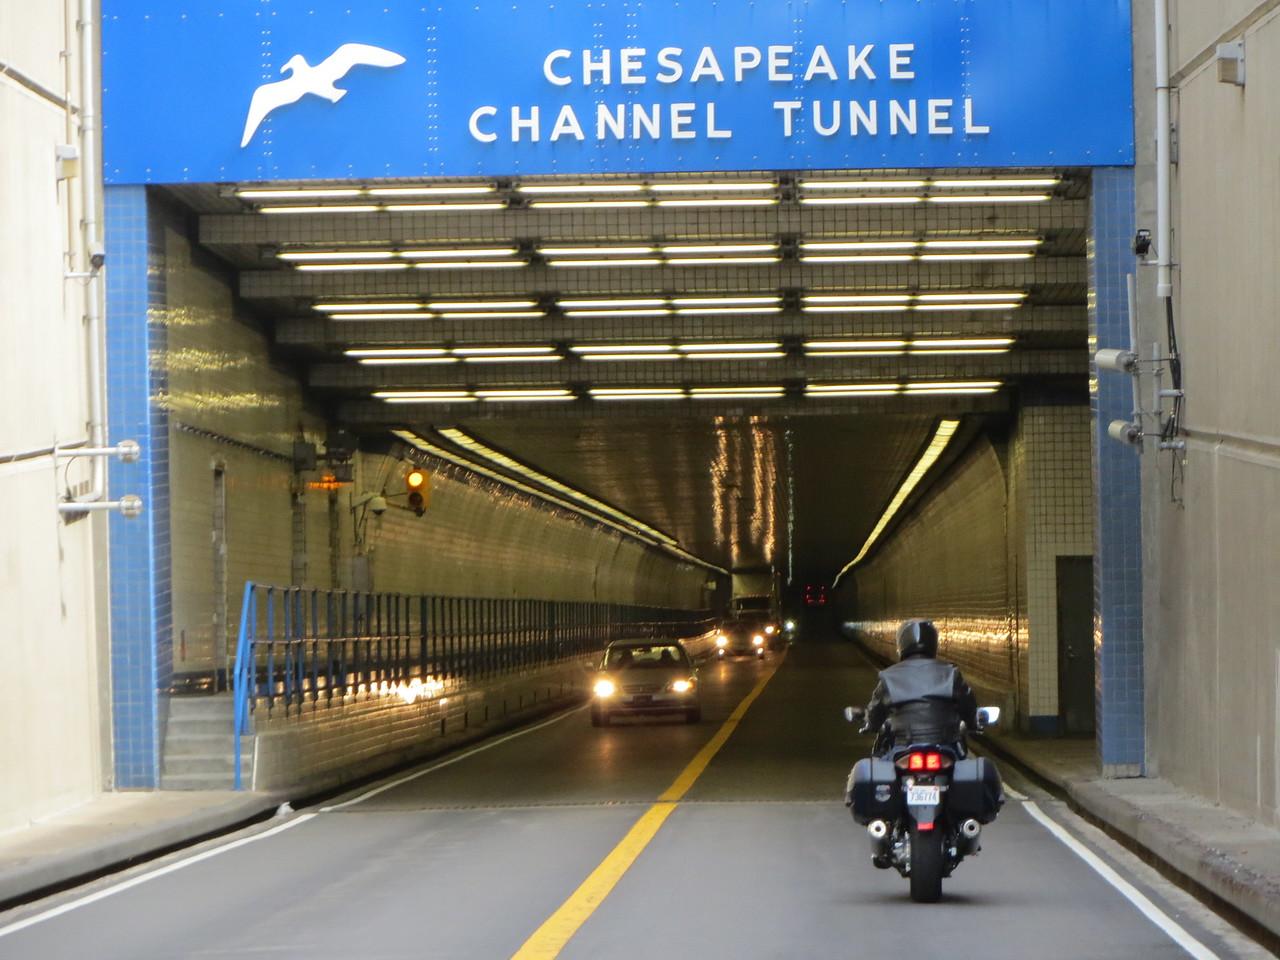 The Chesapeake Channel Tunnel, CBBT.